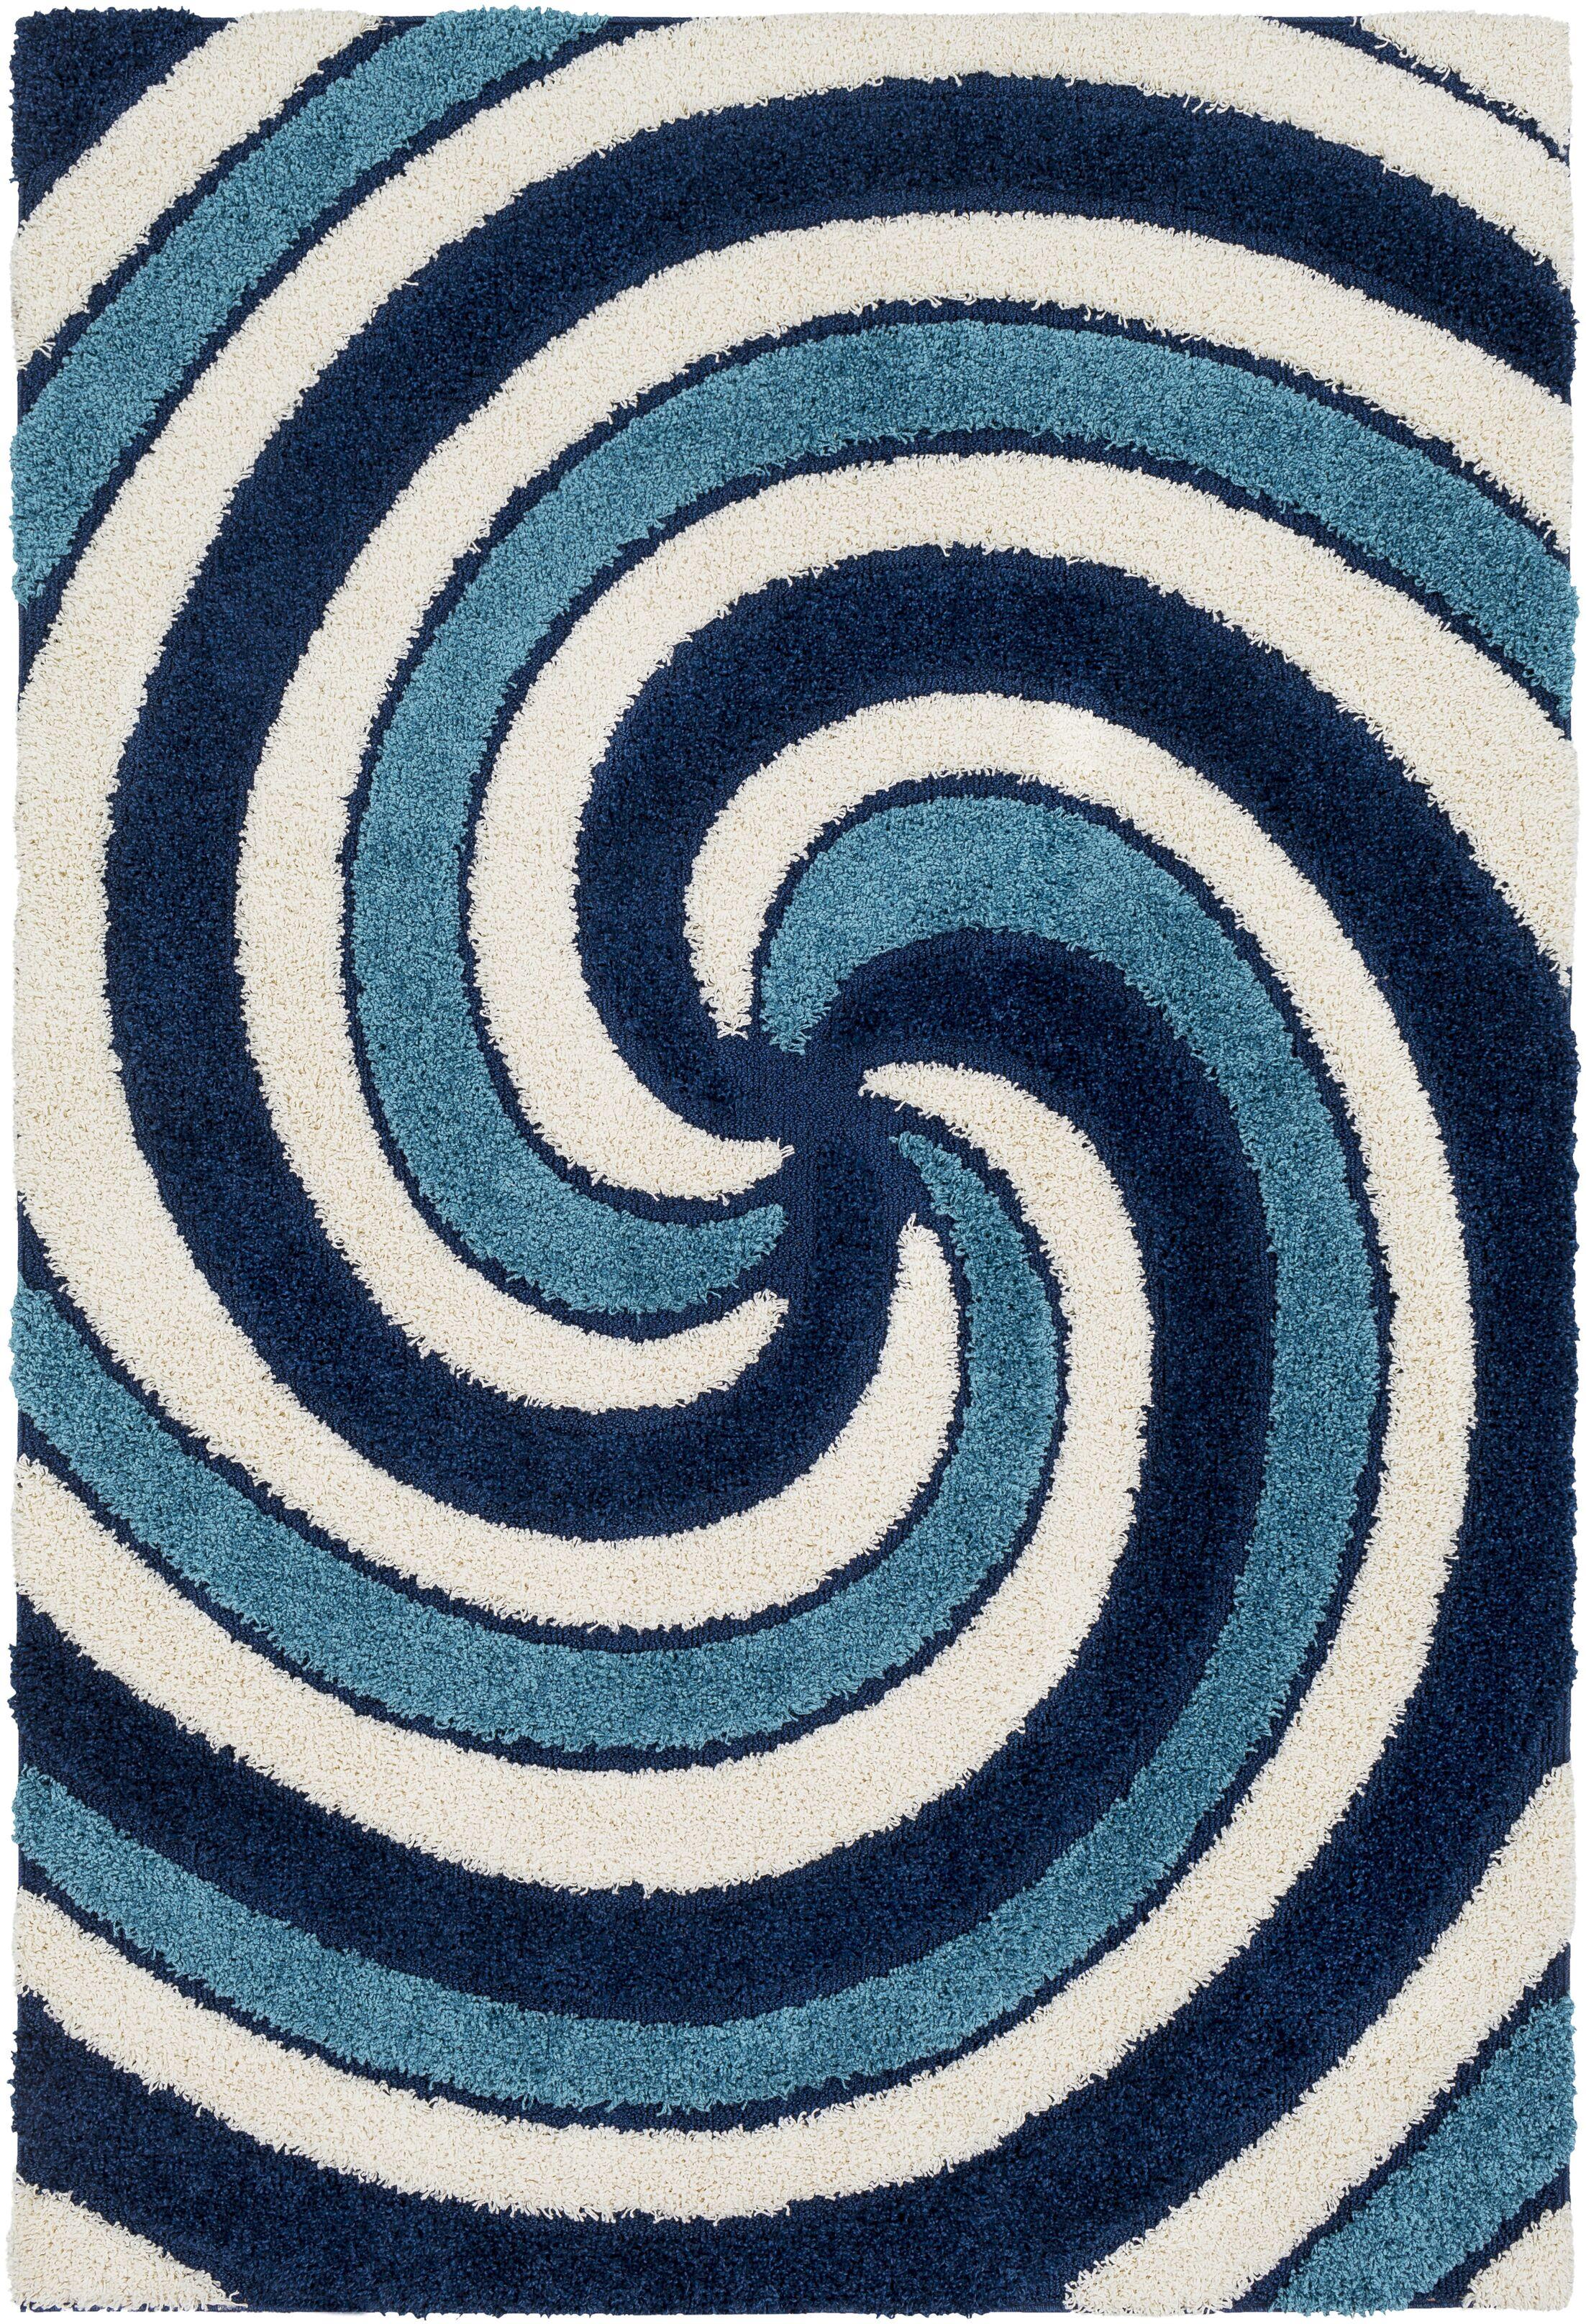 Marketfield Soft Swirly Shag Blue Area Rug Rug Size: Rectangle 7'10